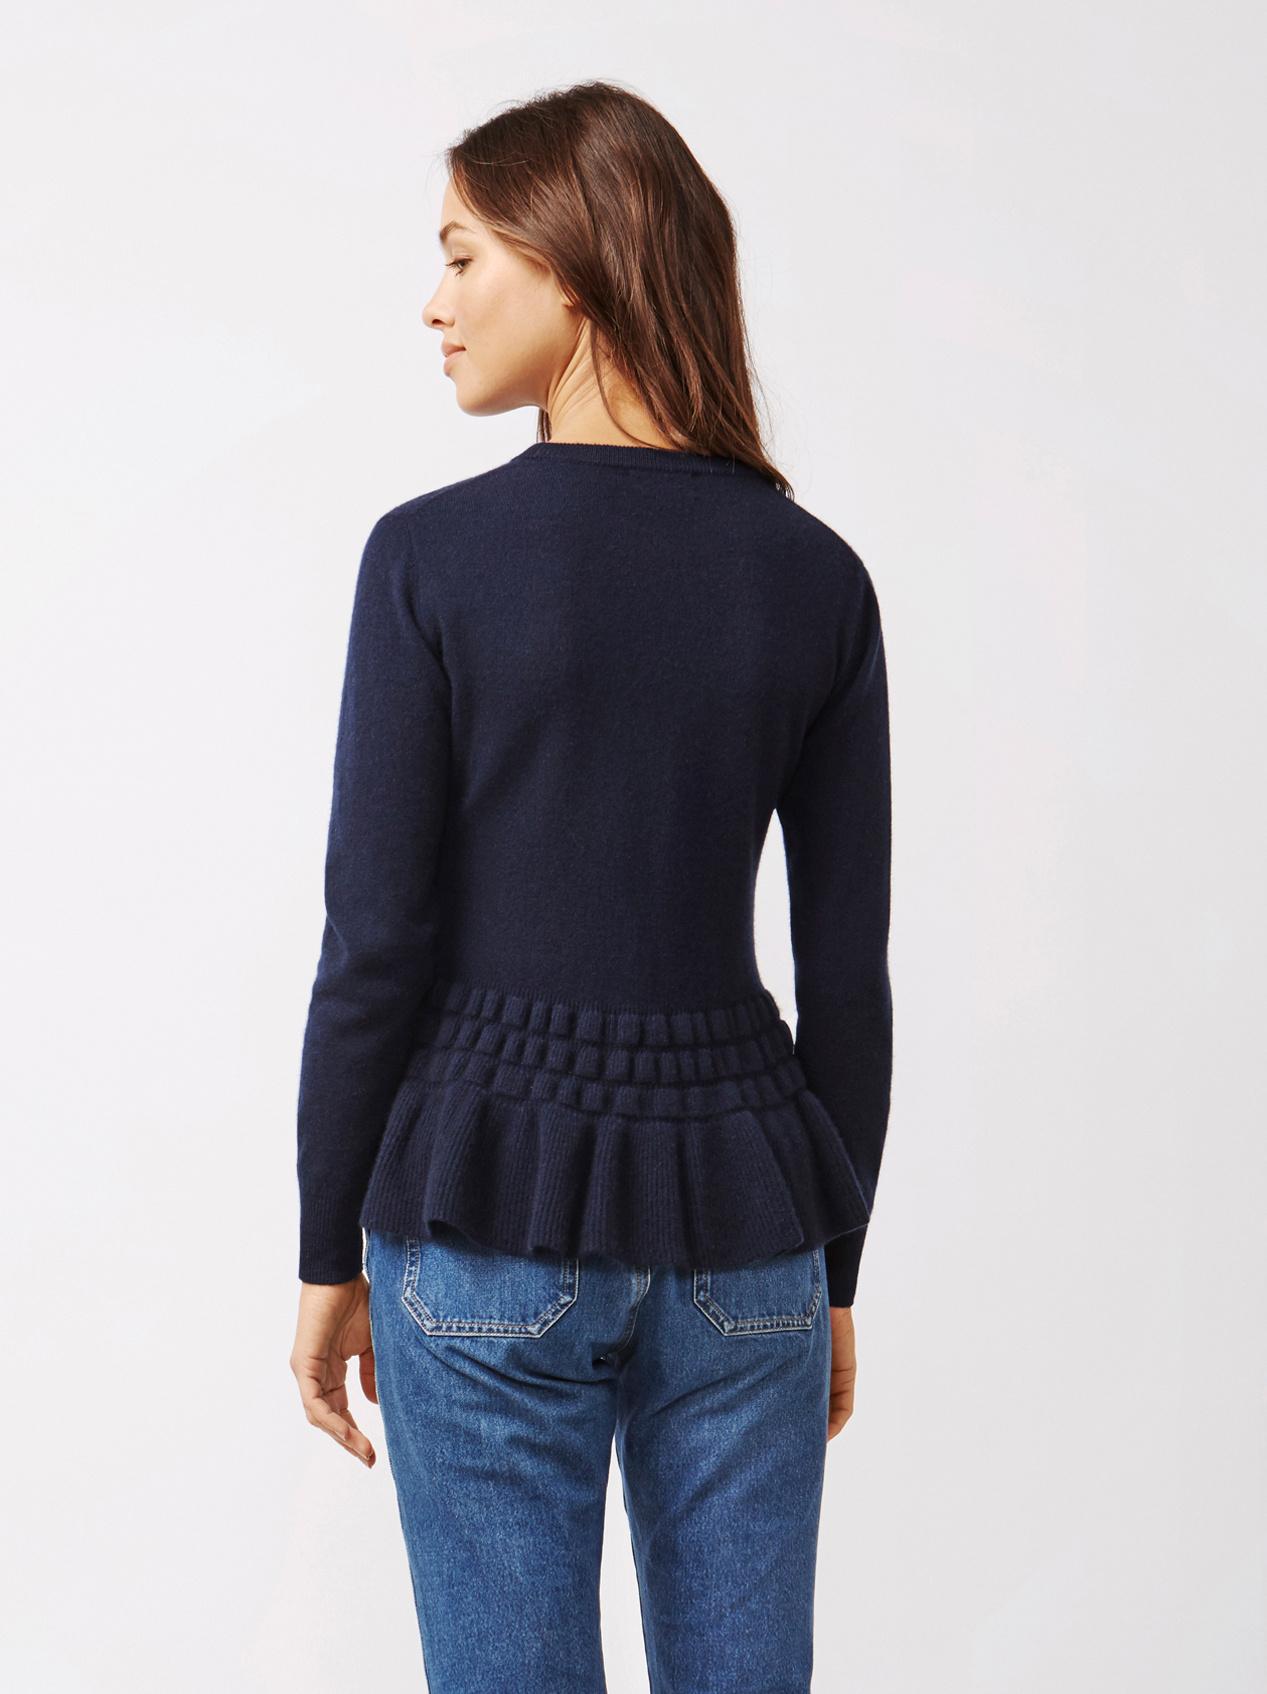 Soft Goat Women's Bottom Ruffle Sweater Navy